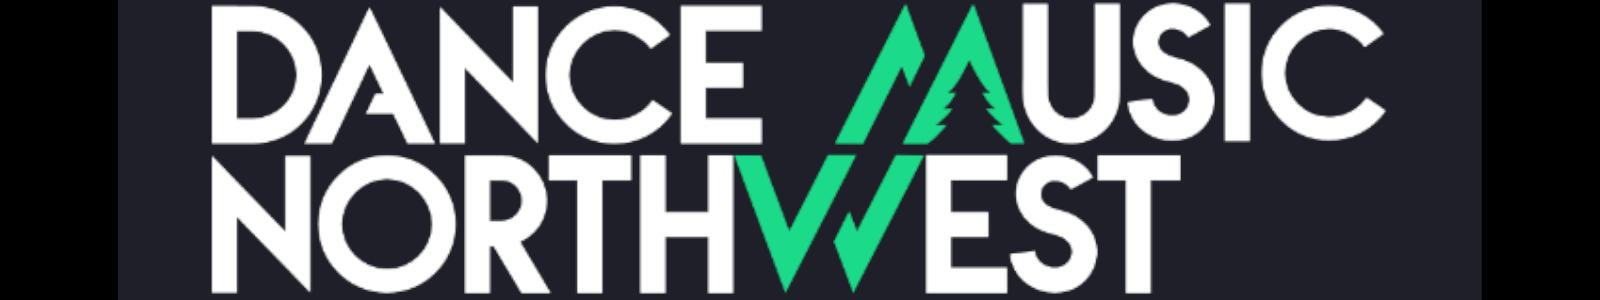 Dance Music Northwest - Business Sponsor of The DJ Sessions